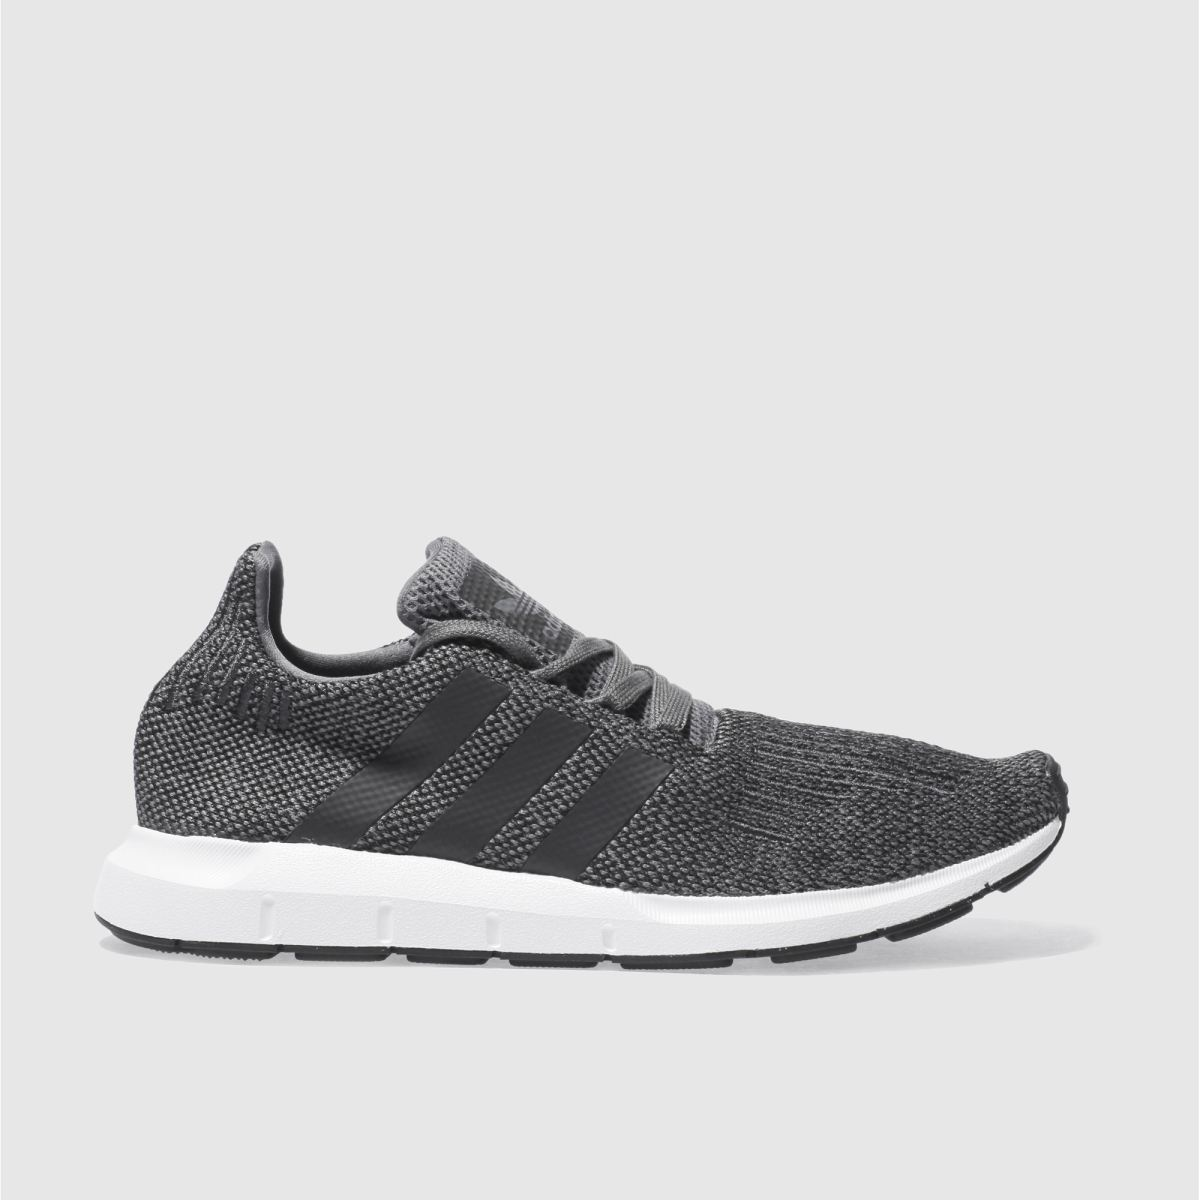 adidas dark grey swift run trainers